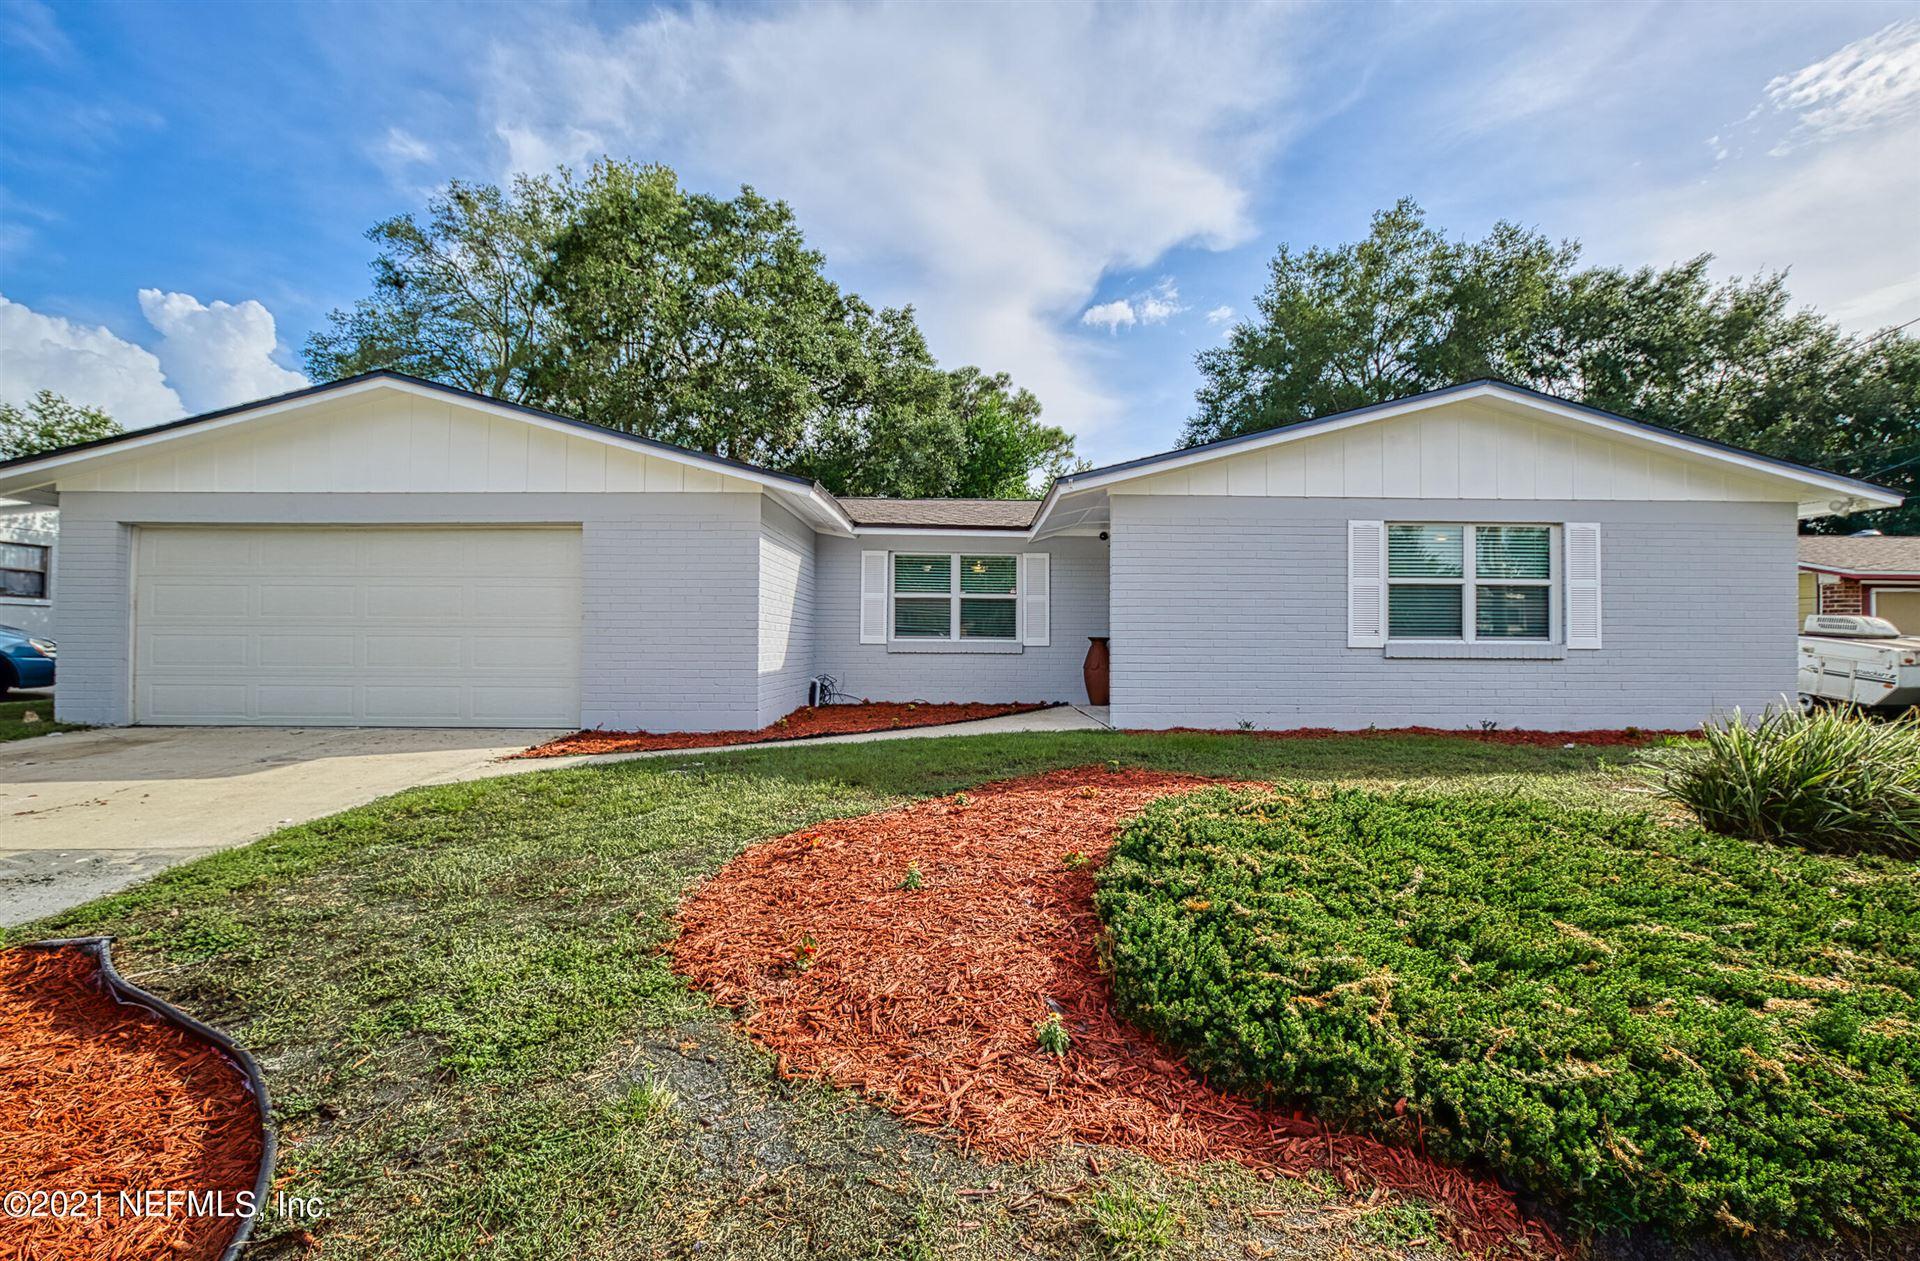 526 CLERMONT AVE S, Orange Park, FL 32073 - MLS#: 1134925